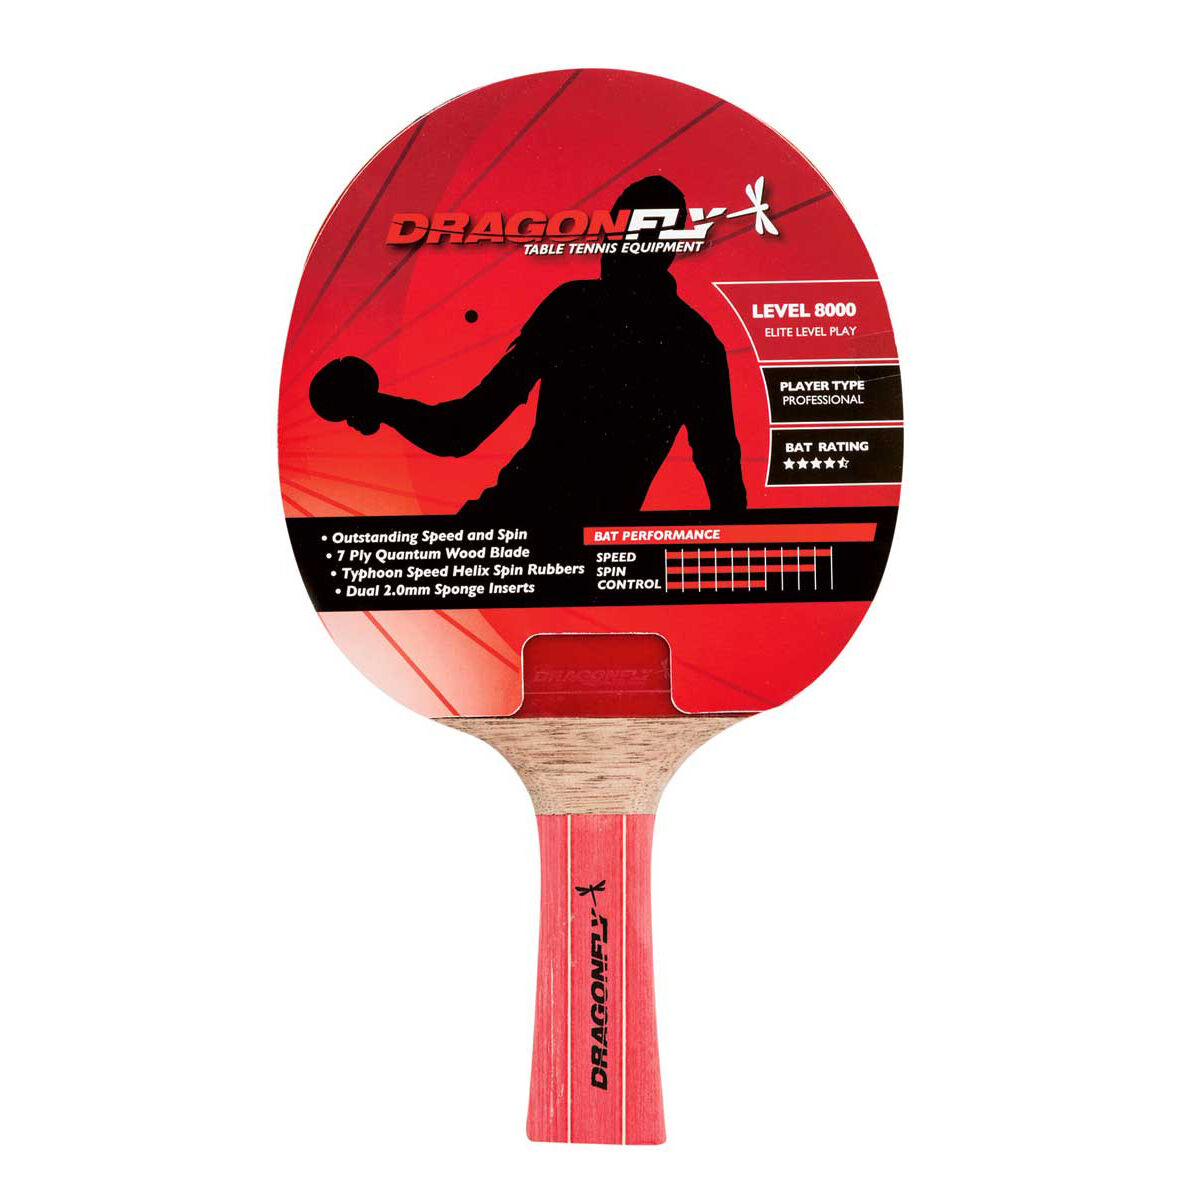 Dragonfly Pro 8000 Table Tennis Bat